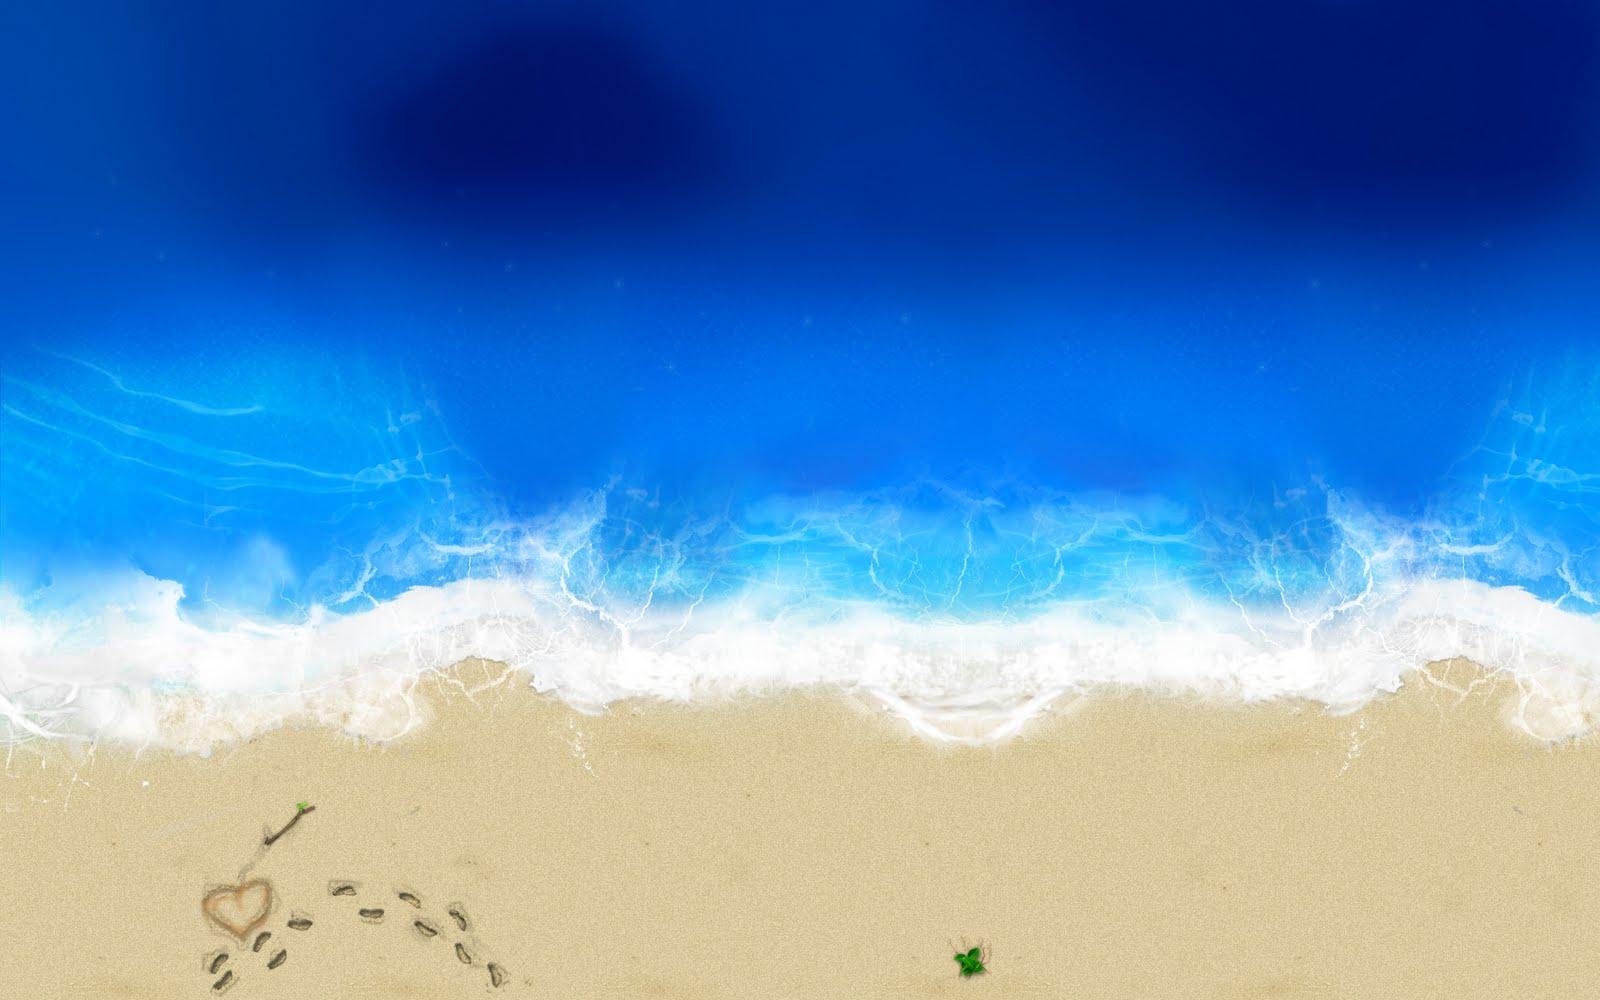 http://2.bp.blogspot.com/-FBYryoonATI/Th33LAhmwLI/AAAAAAAAAmo/jscHUCqSqZ8/s1600/love-beach.jpg